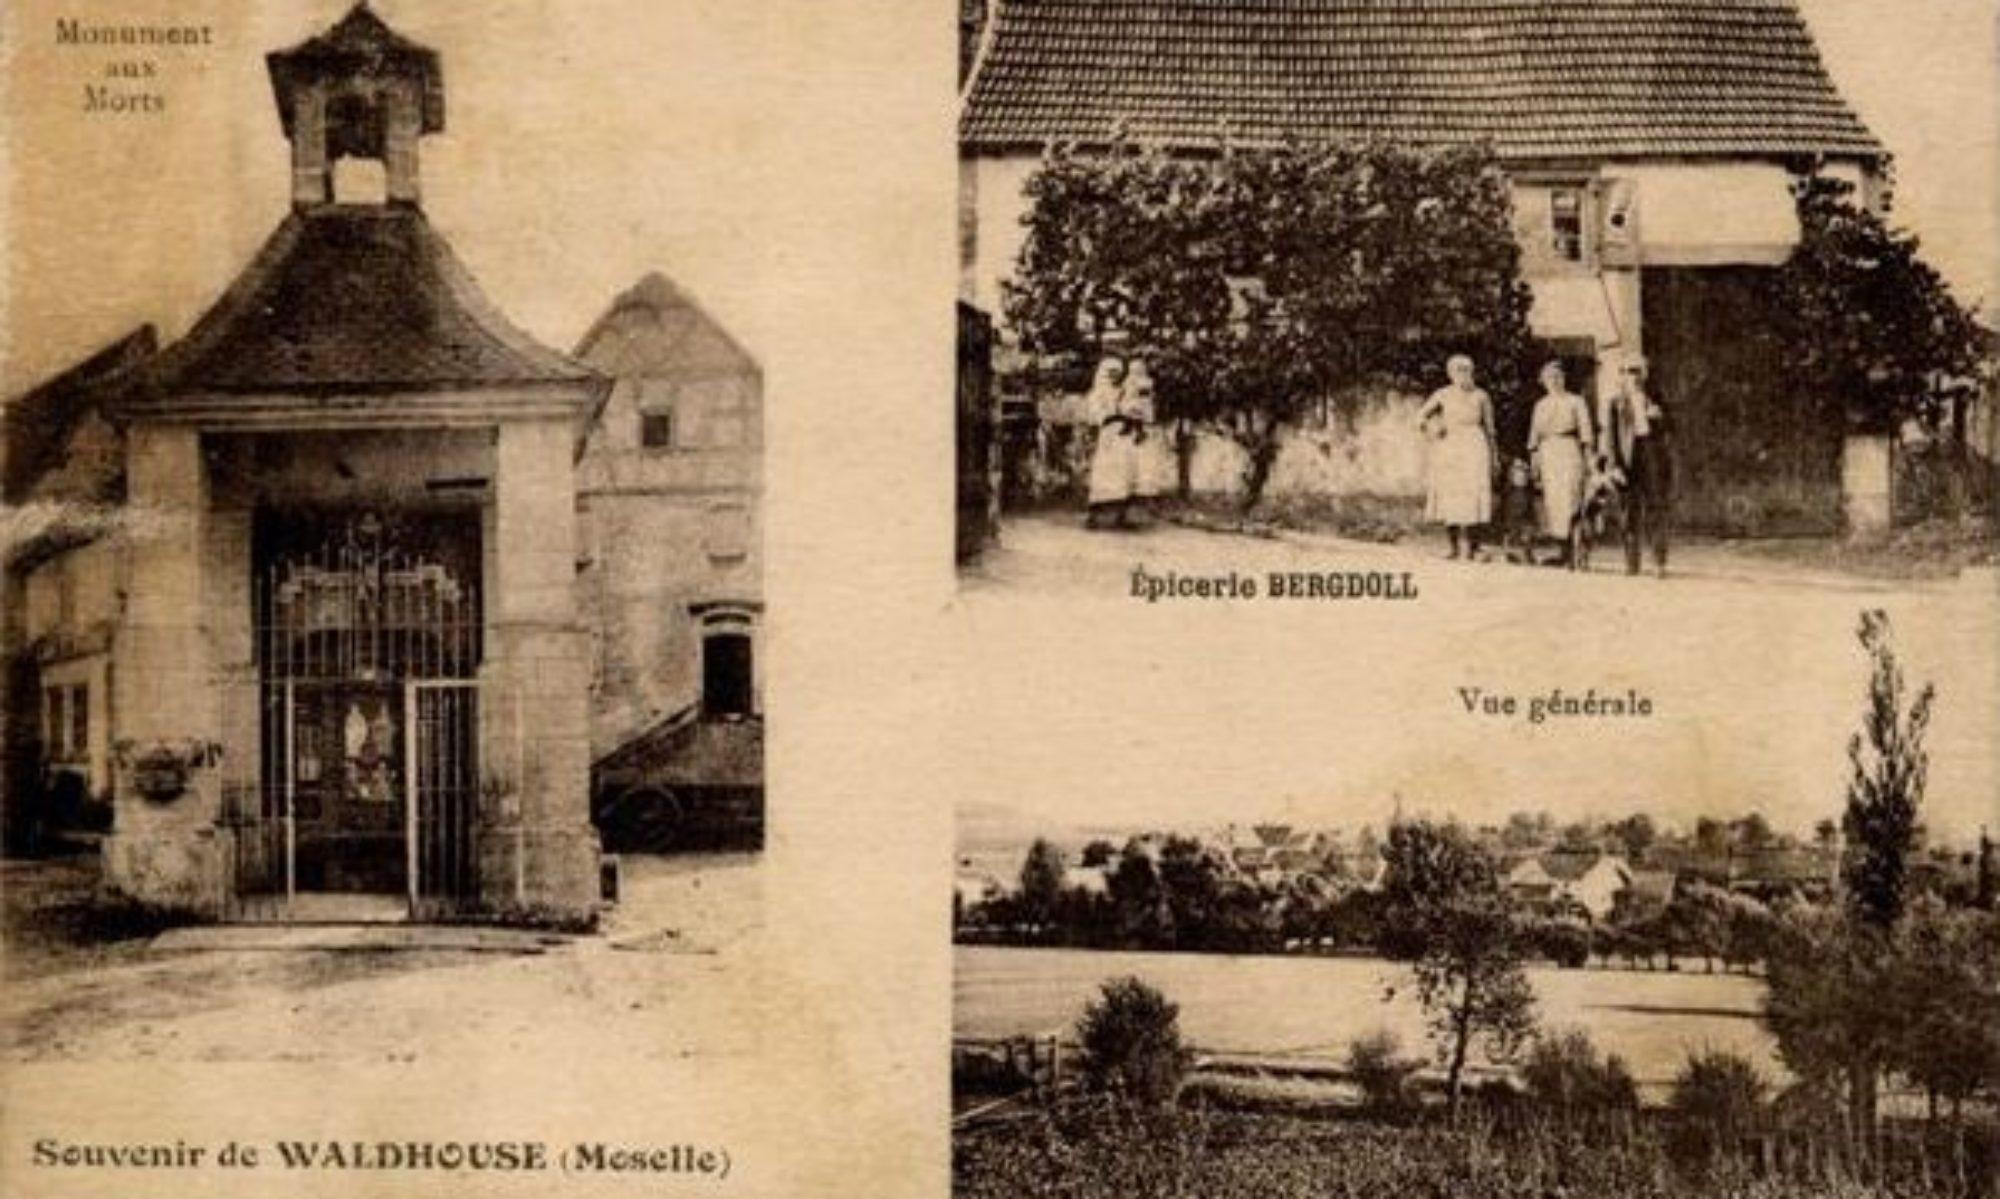 Waldhouse